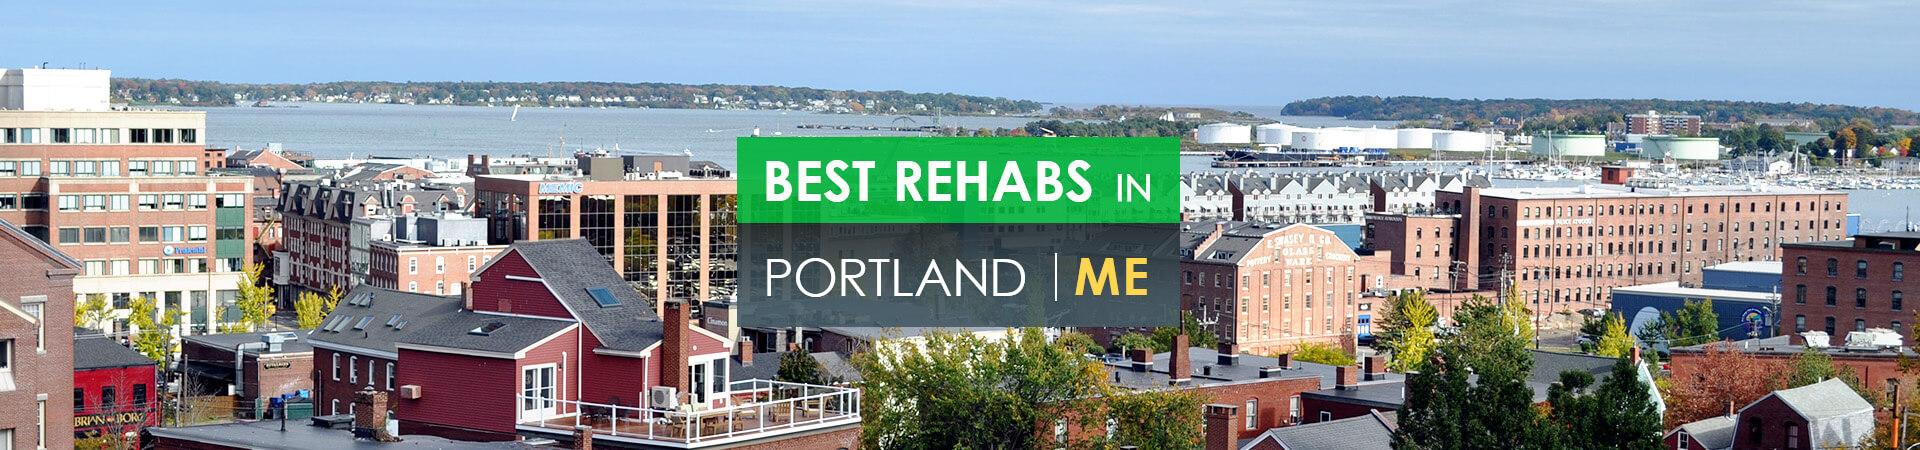 Best rehabs in Portland, ME